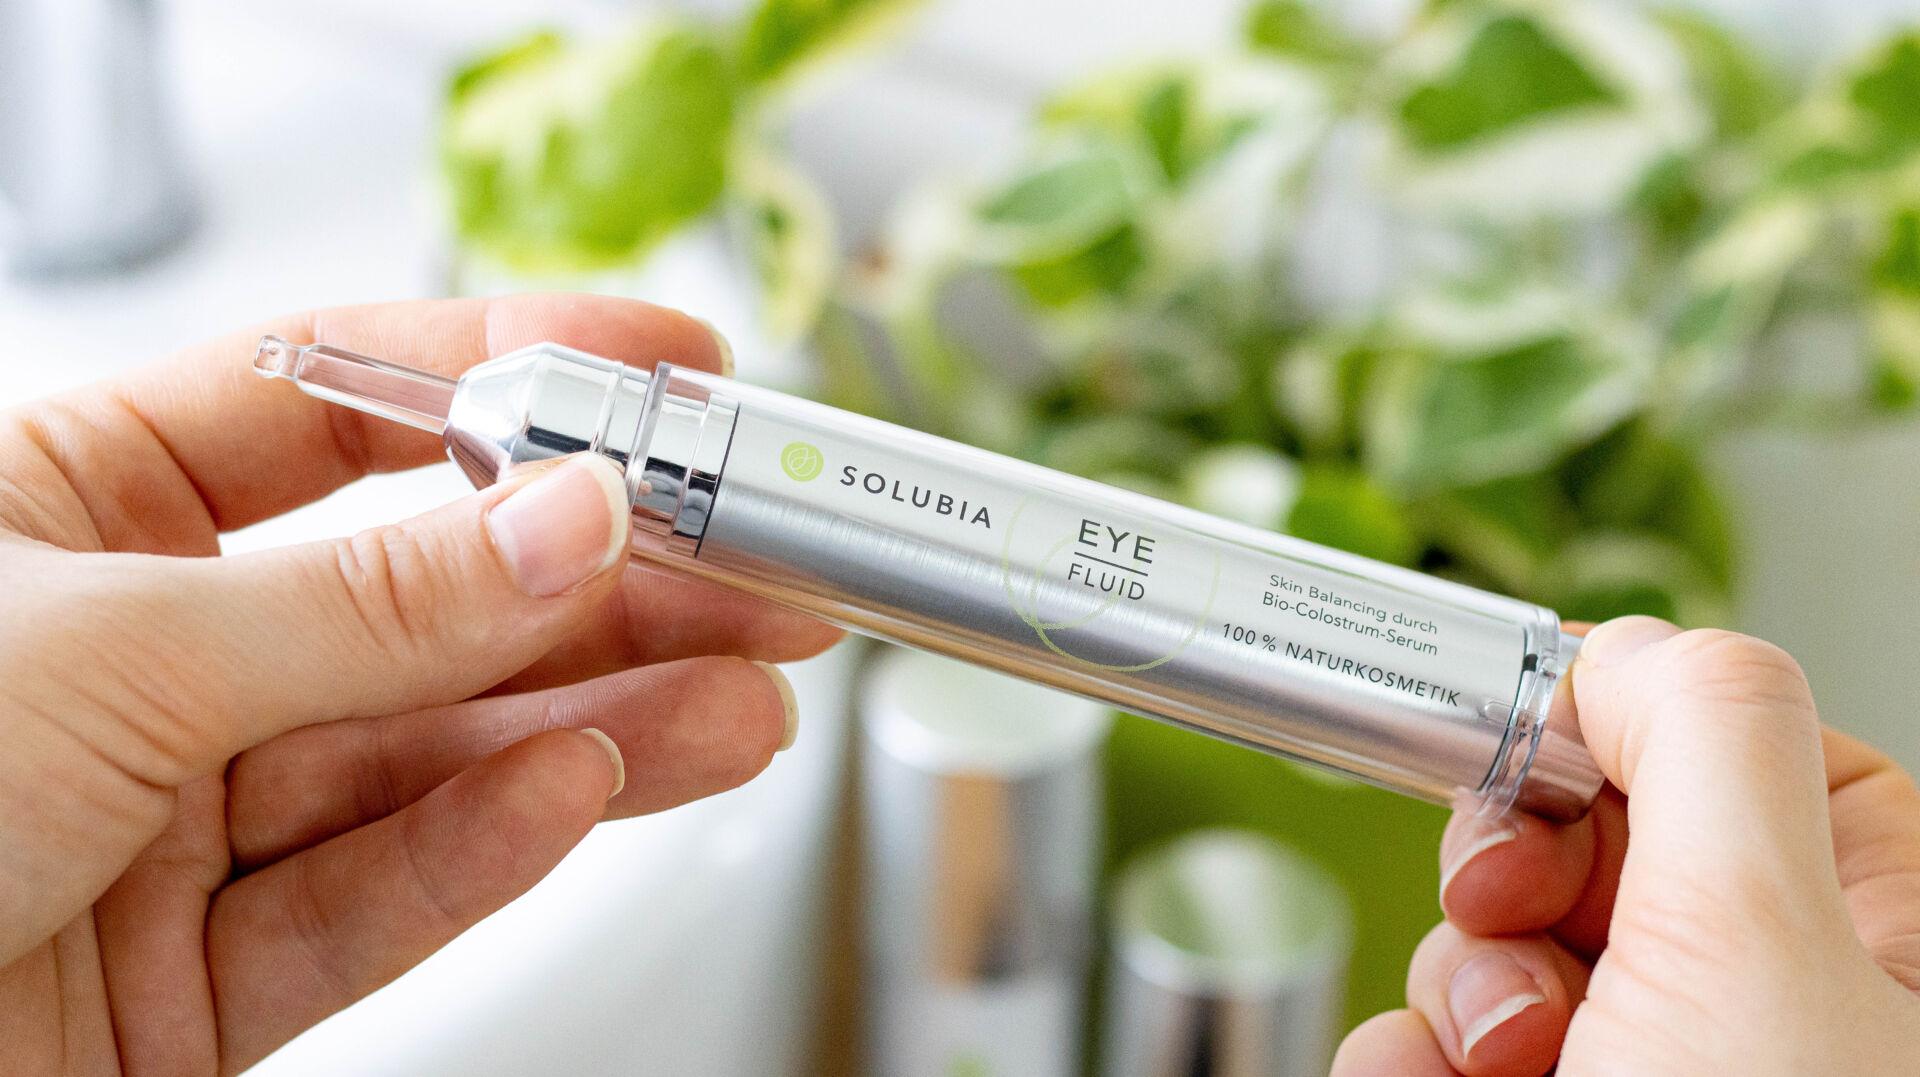 Anzeige: Anti-Aging-Hautpflege mit WOW-Effekt – Solubia EGF Pflege